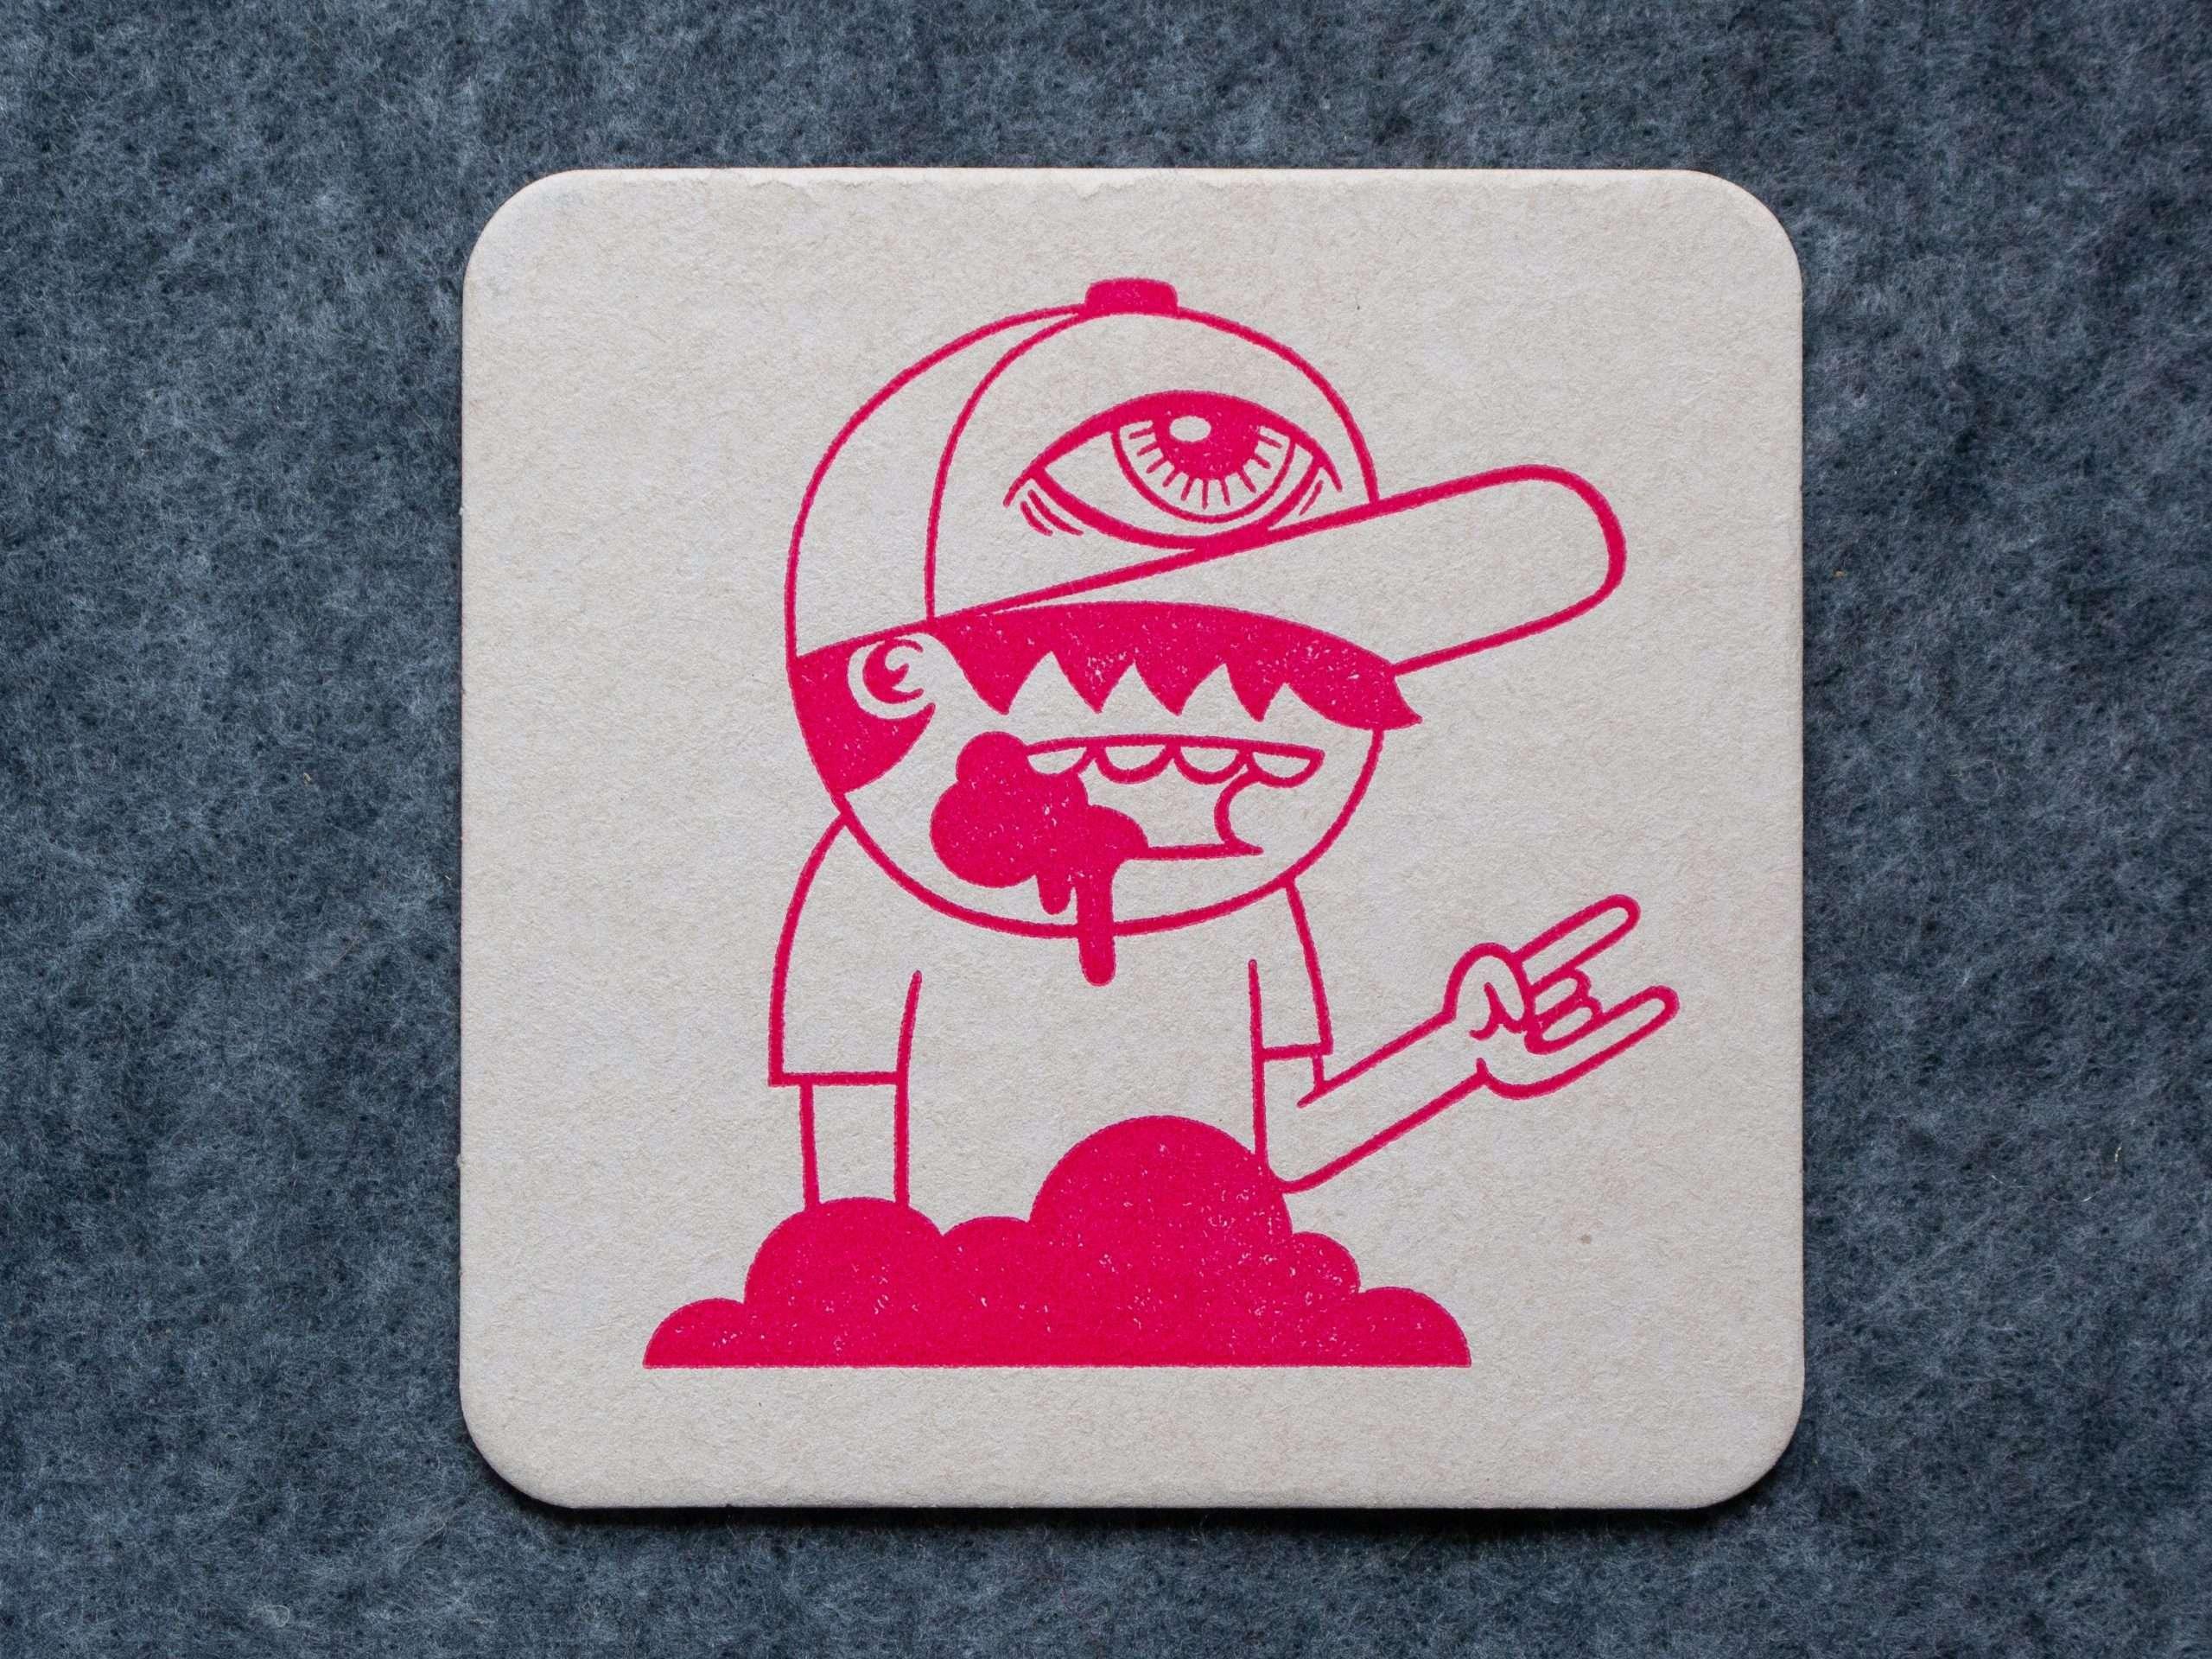 Character with baseball cap